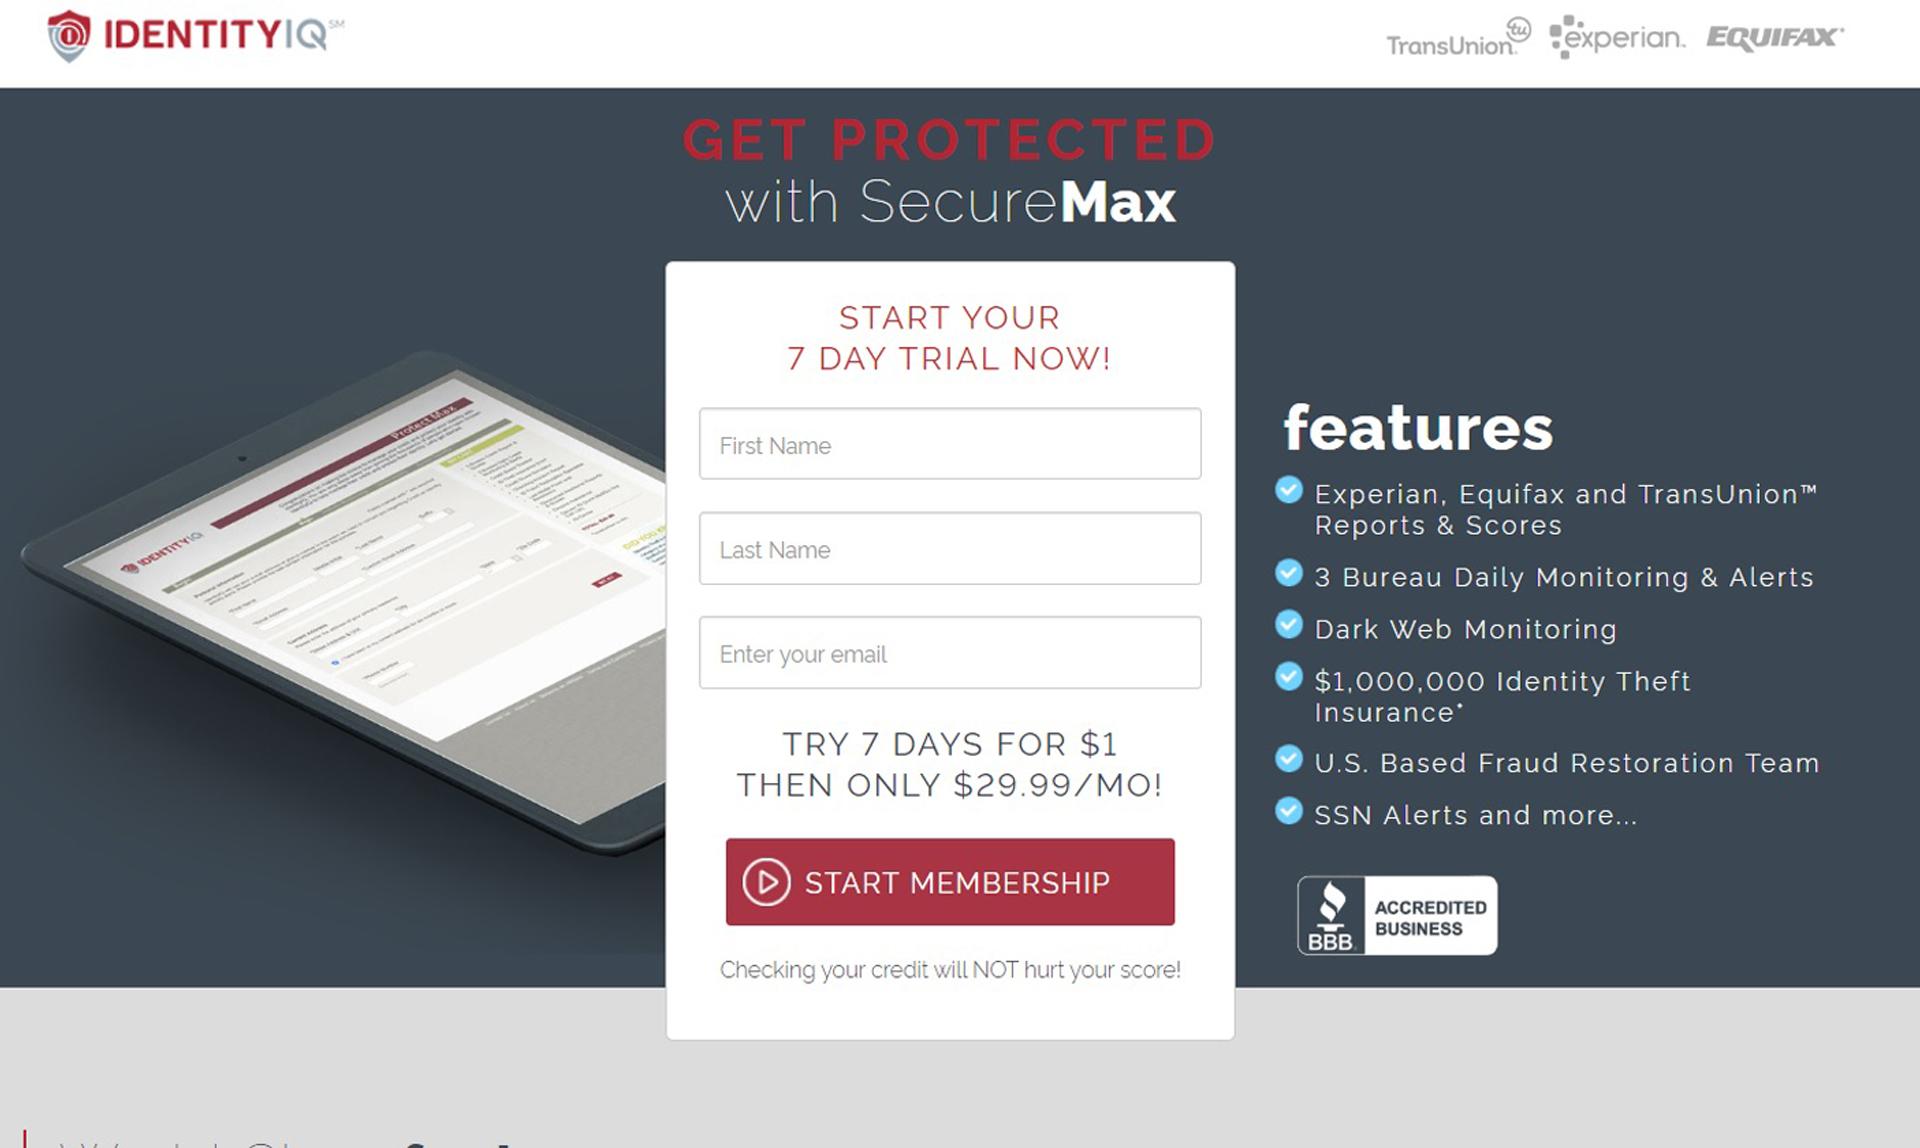 IdentityIQ Secure Max review